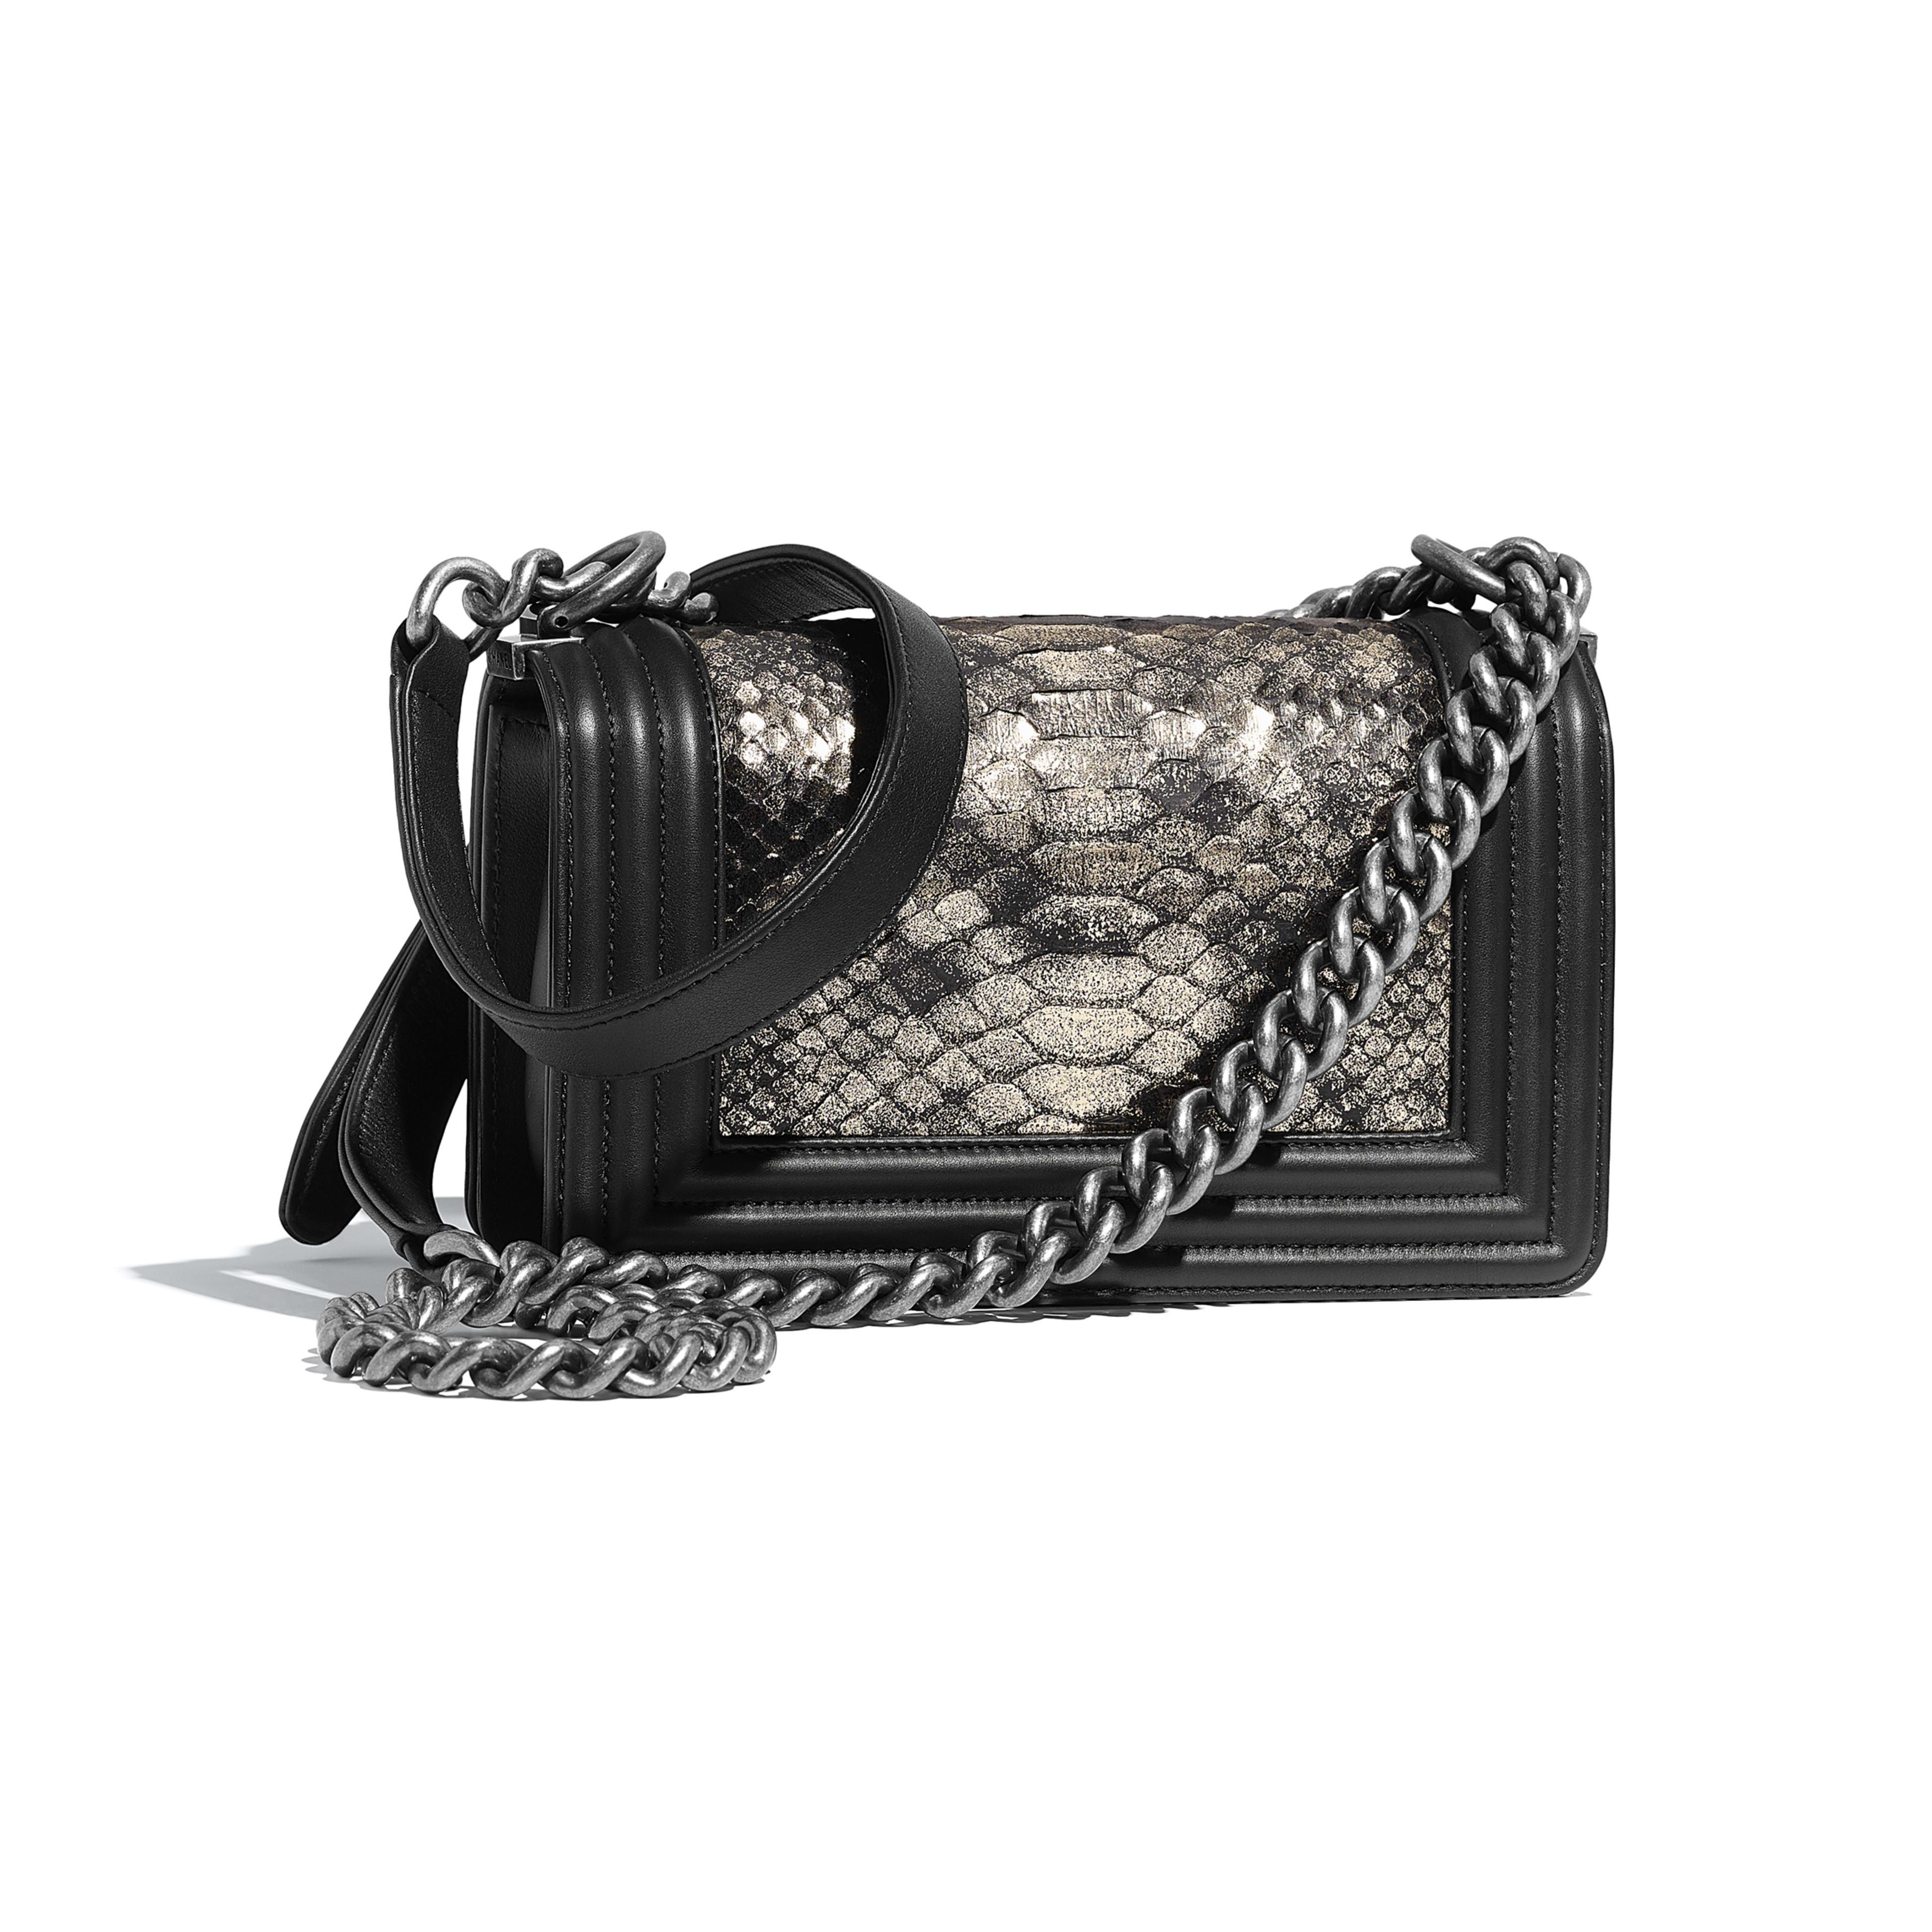 Small BOY CHANEL Handbag - Silver & Black - python, calfskin & ruthenium-finish metal - Alternative view - see full sized version